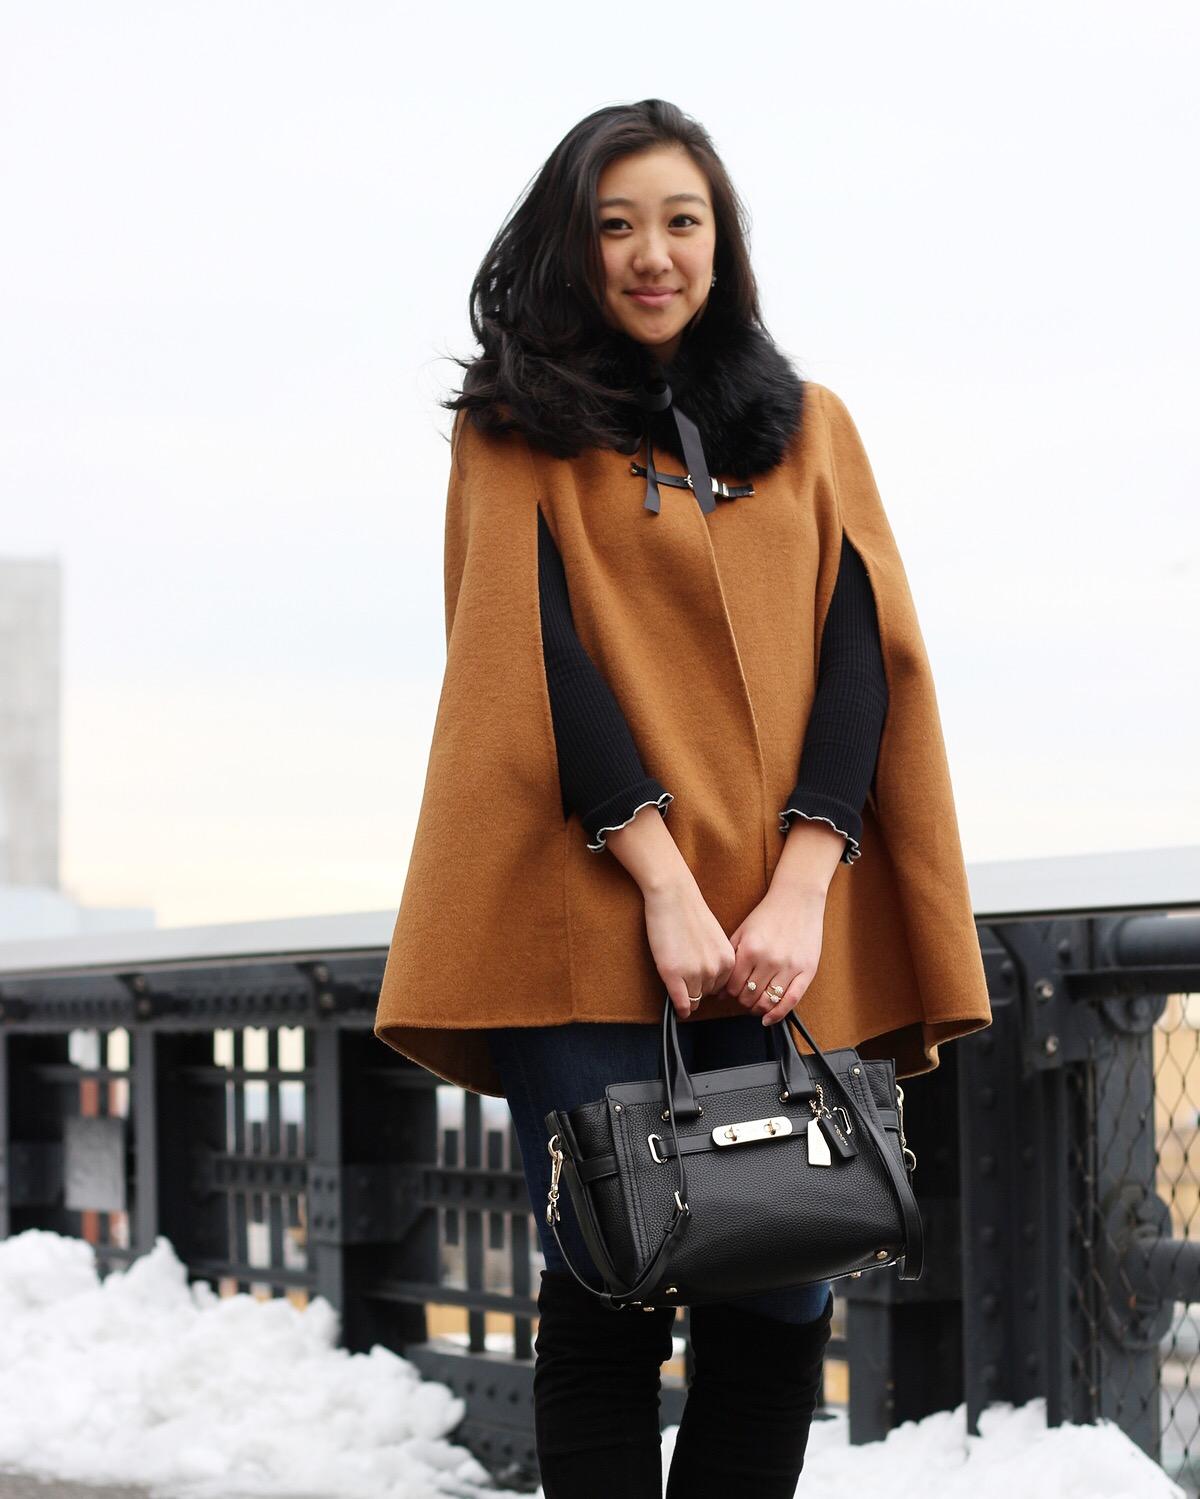 Cape: Zara but it's sold out so I've linked a similar  here  | Bag:  Coach  | Faux Fur Stole:  BCBGeneration | Boots:  Stuart Weitzman